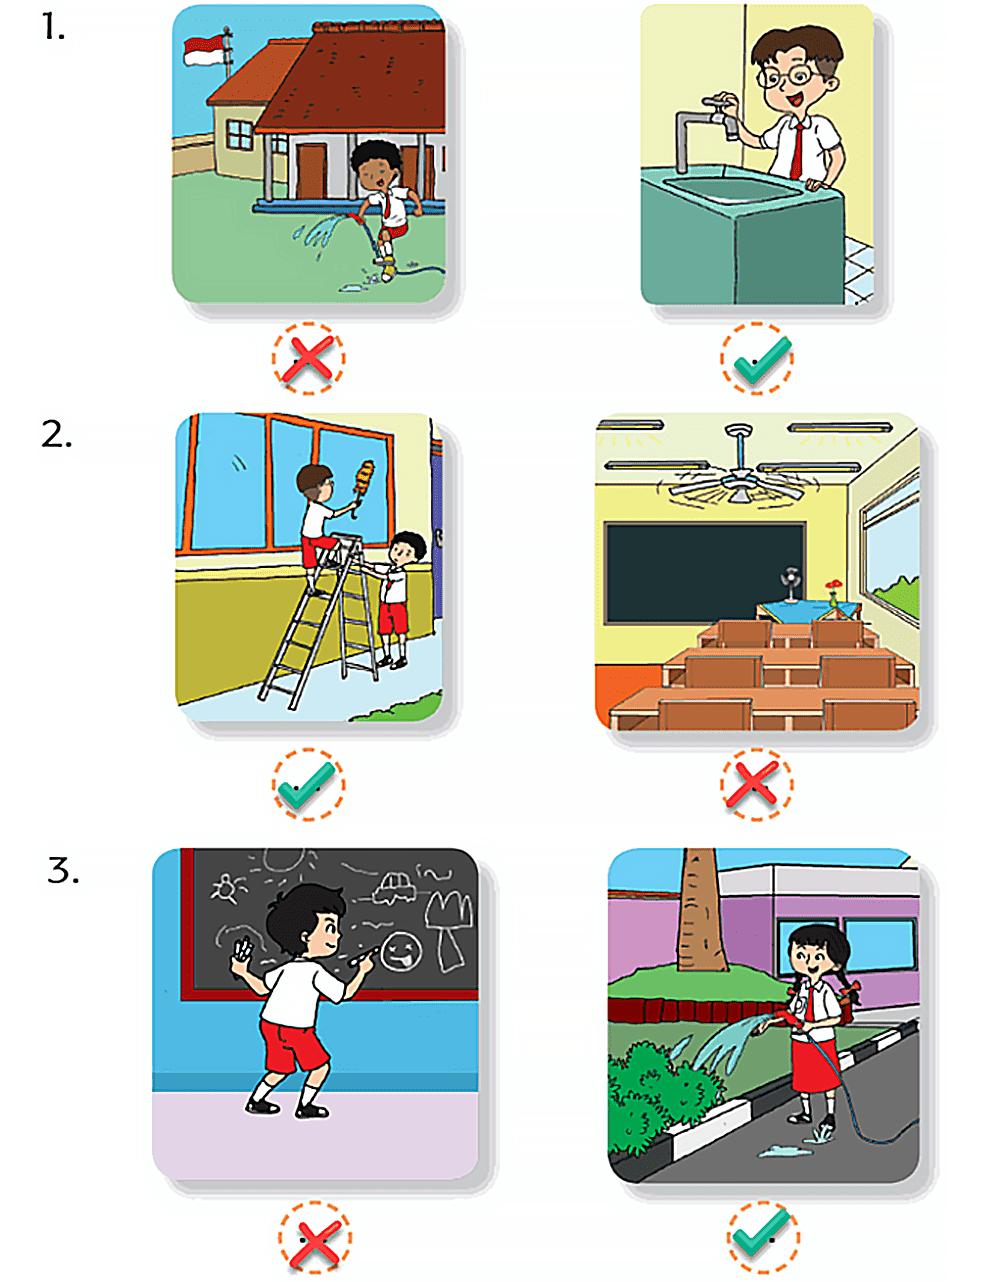 Kunci Jawaban Halaman 90 91 92 93 94 Tema 6 Kelas 3 Di 2021 Kunci Buku Buku Pelajaran